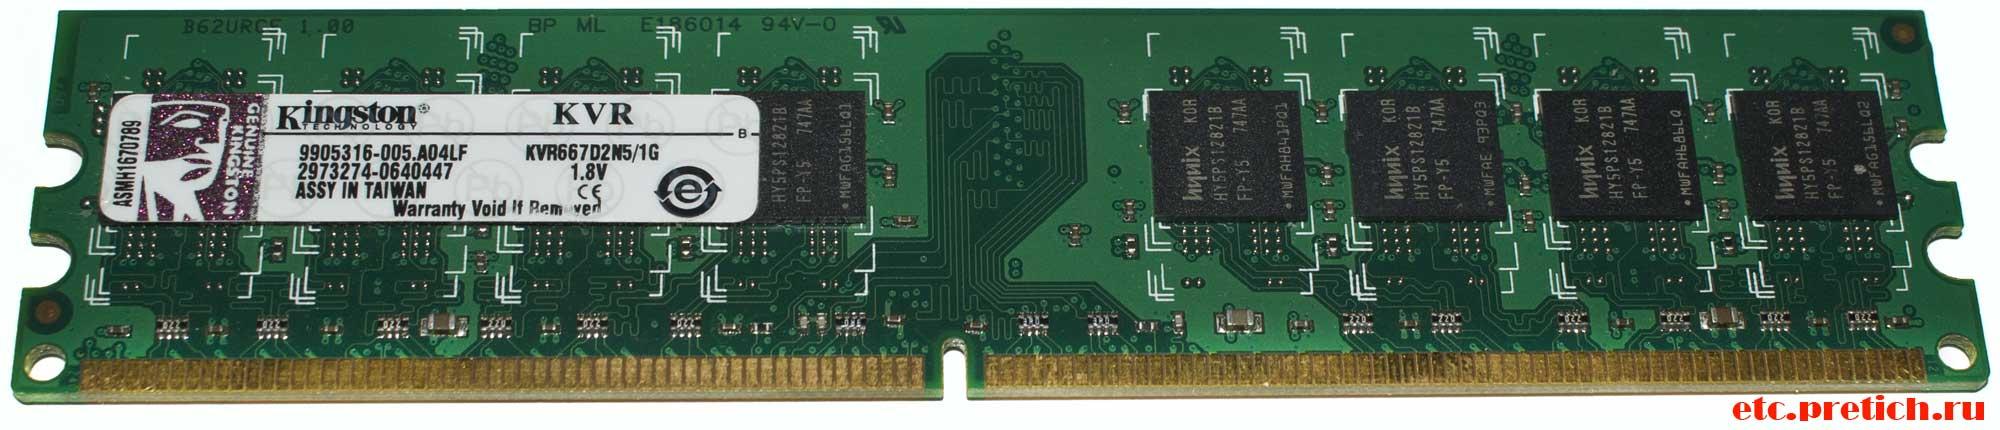 Описание Kingston KVR667D2N5/1G оперативная память DDR2 что делать?